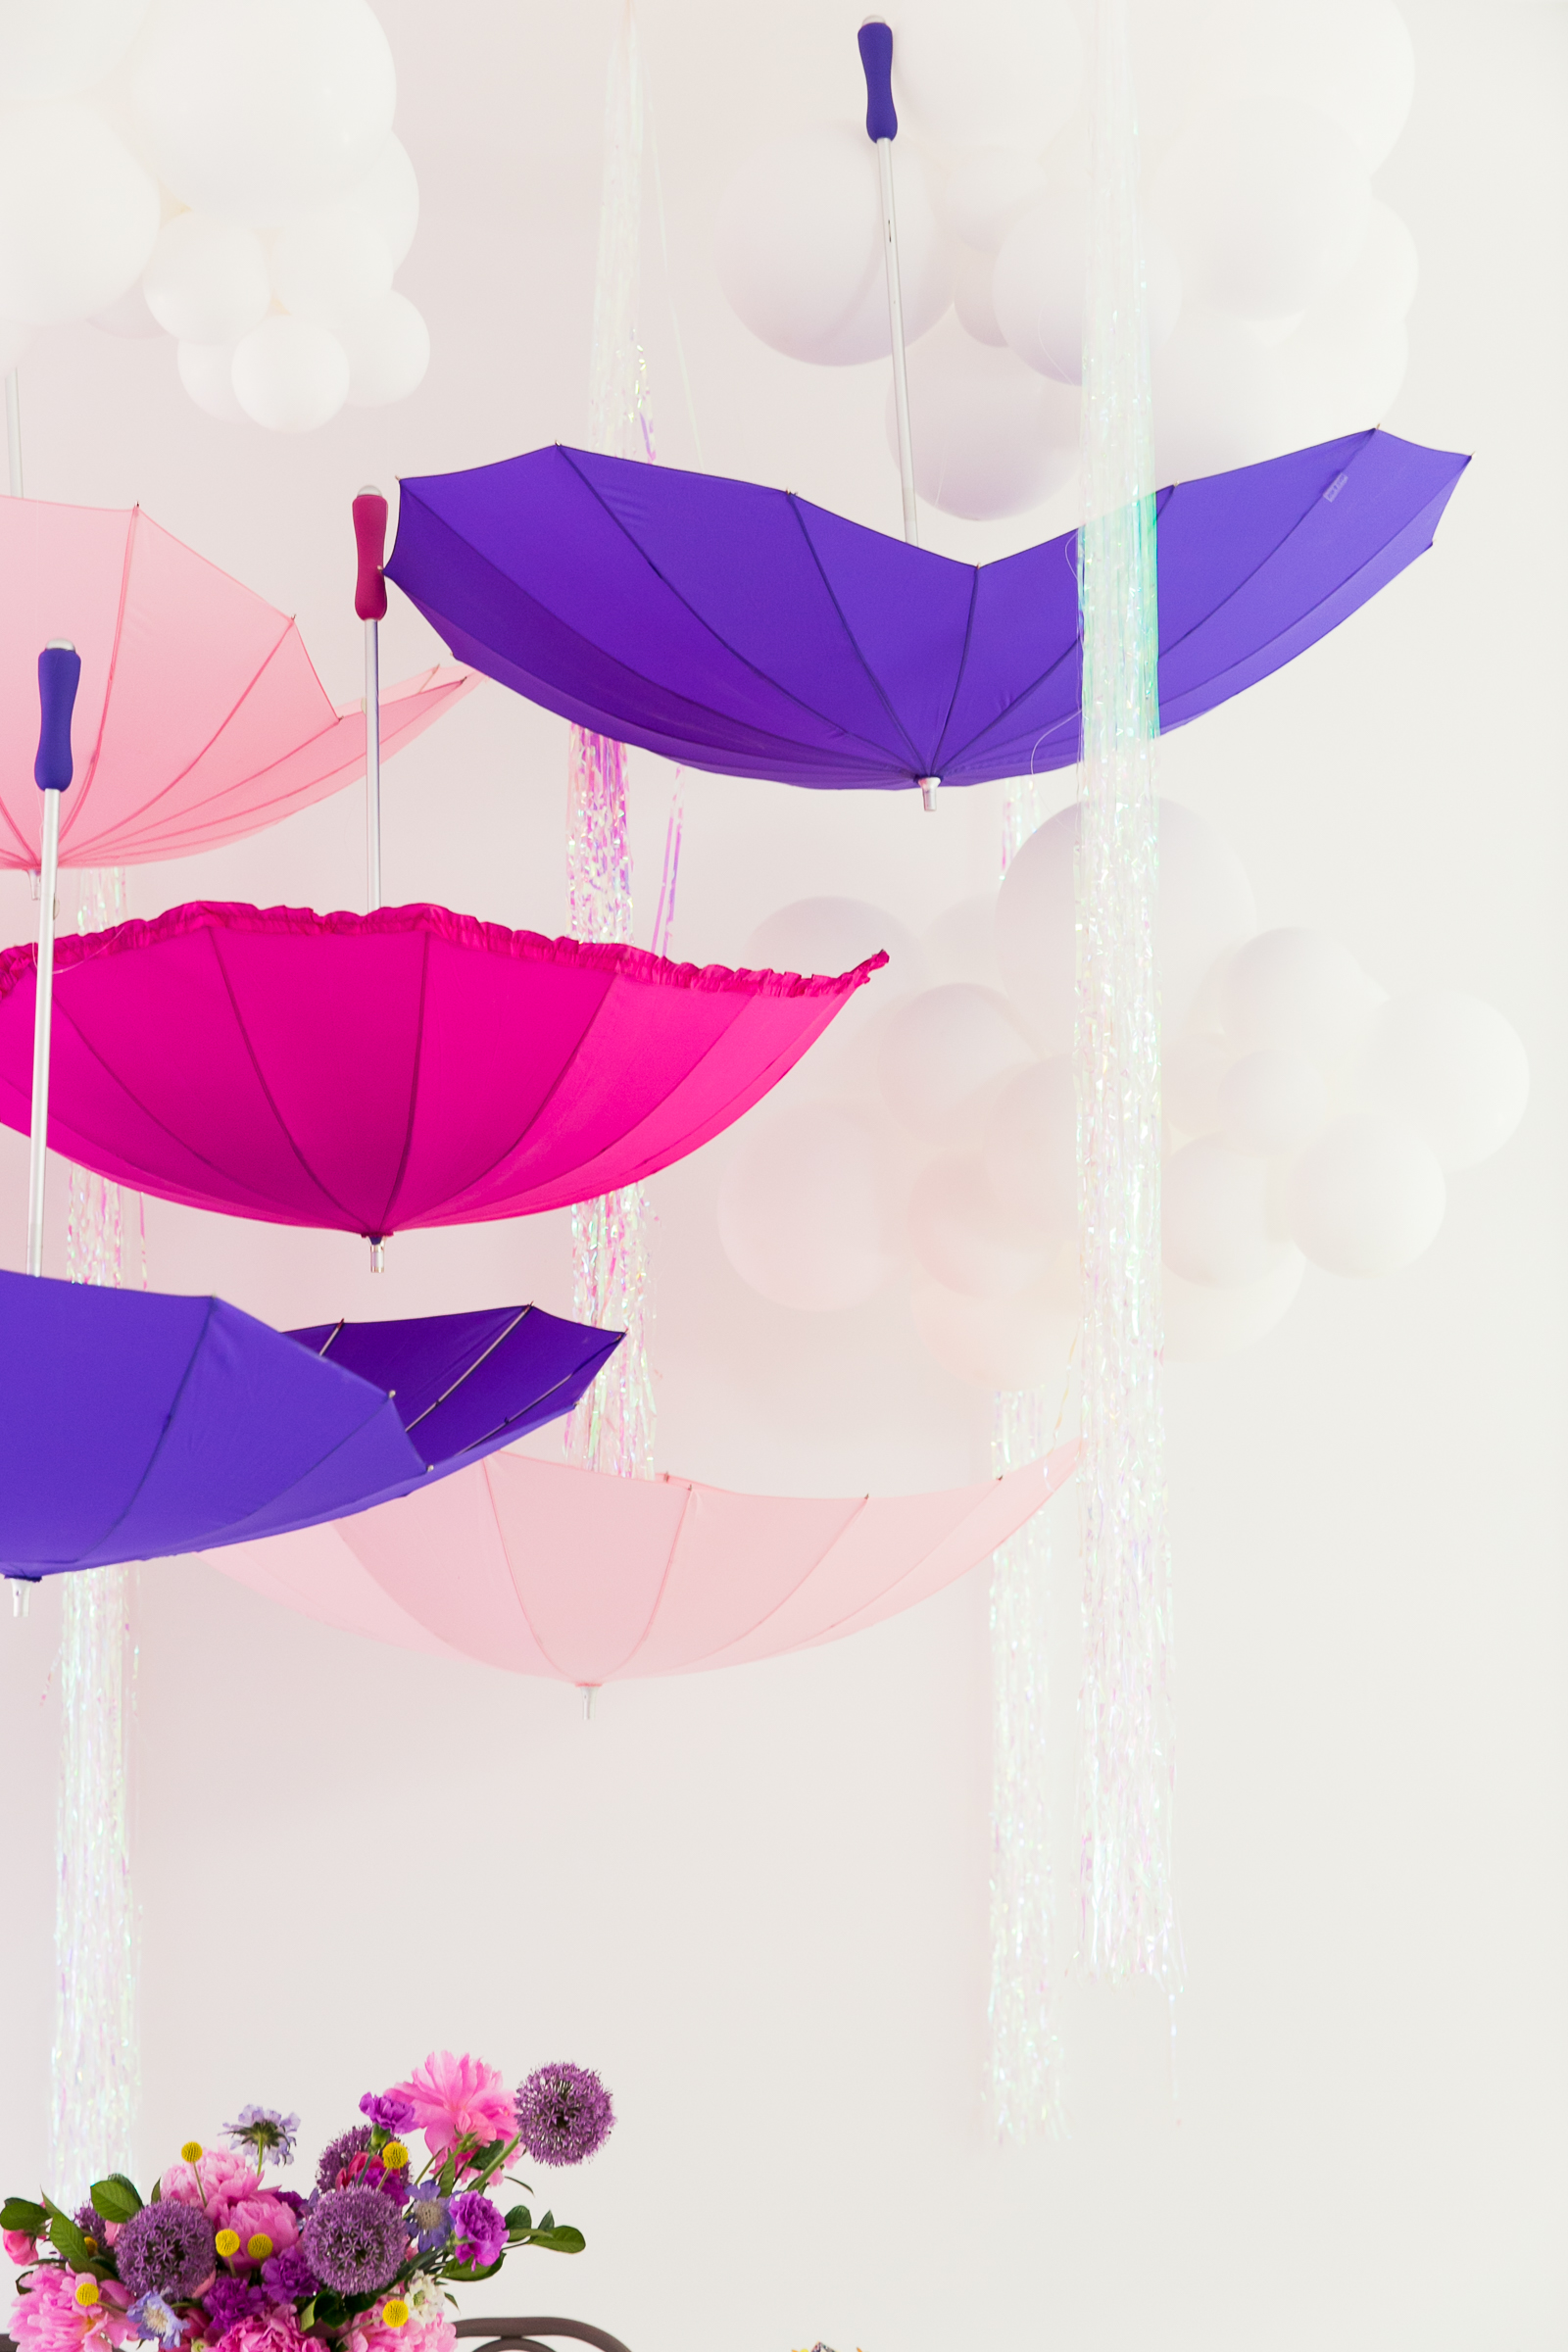 Oui Party - Peppa Pig Party - Umbrella Installation 1.jpg